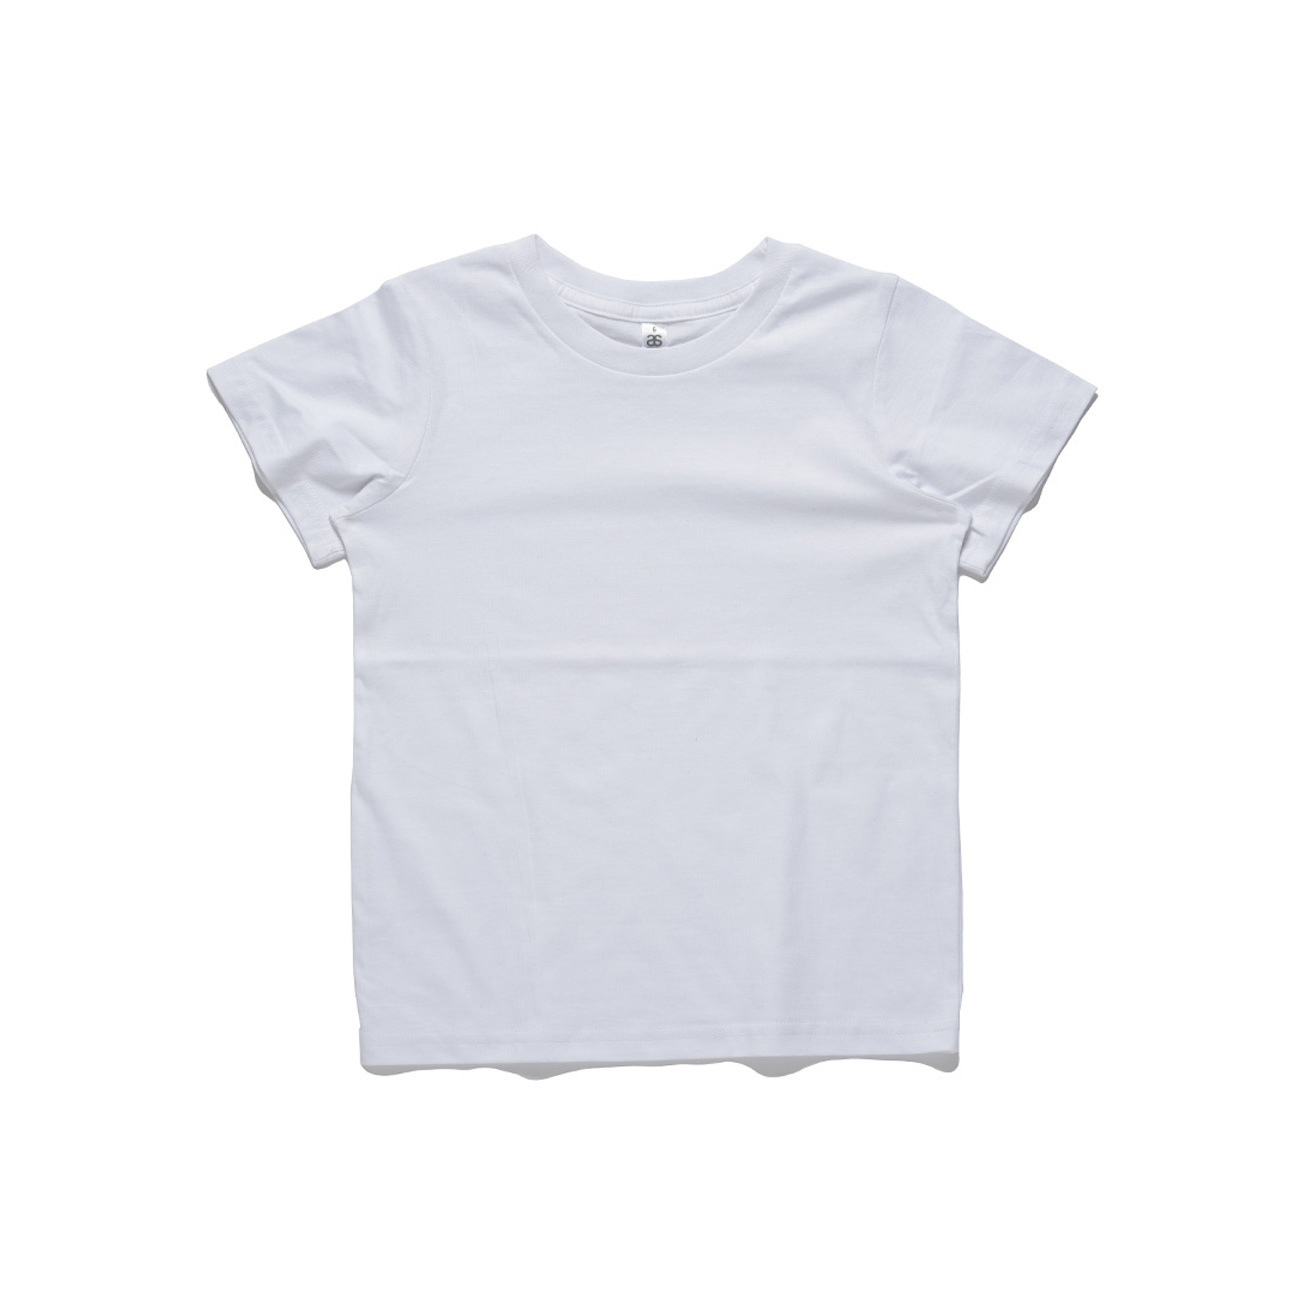 3262c9005 T-Shirt-printing